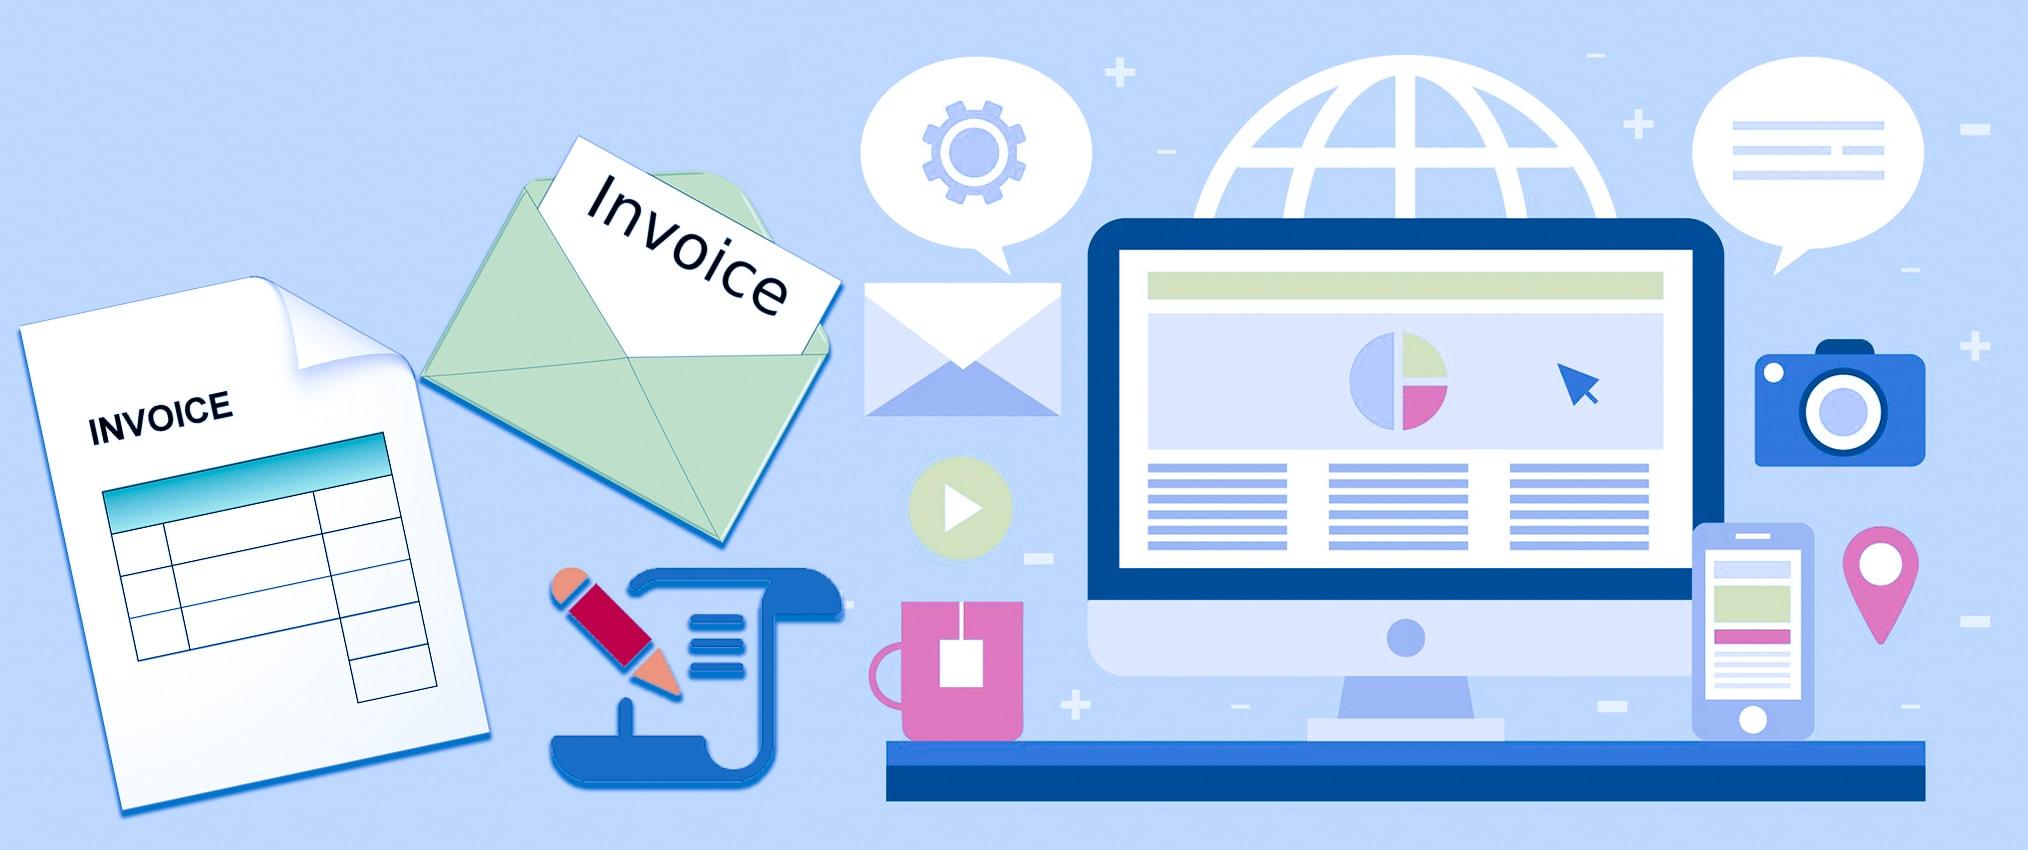 invoice-reciept-data-entry